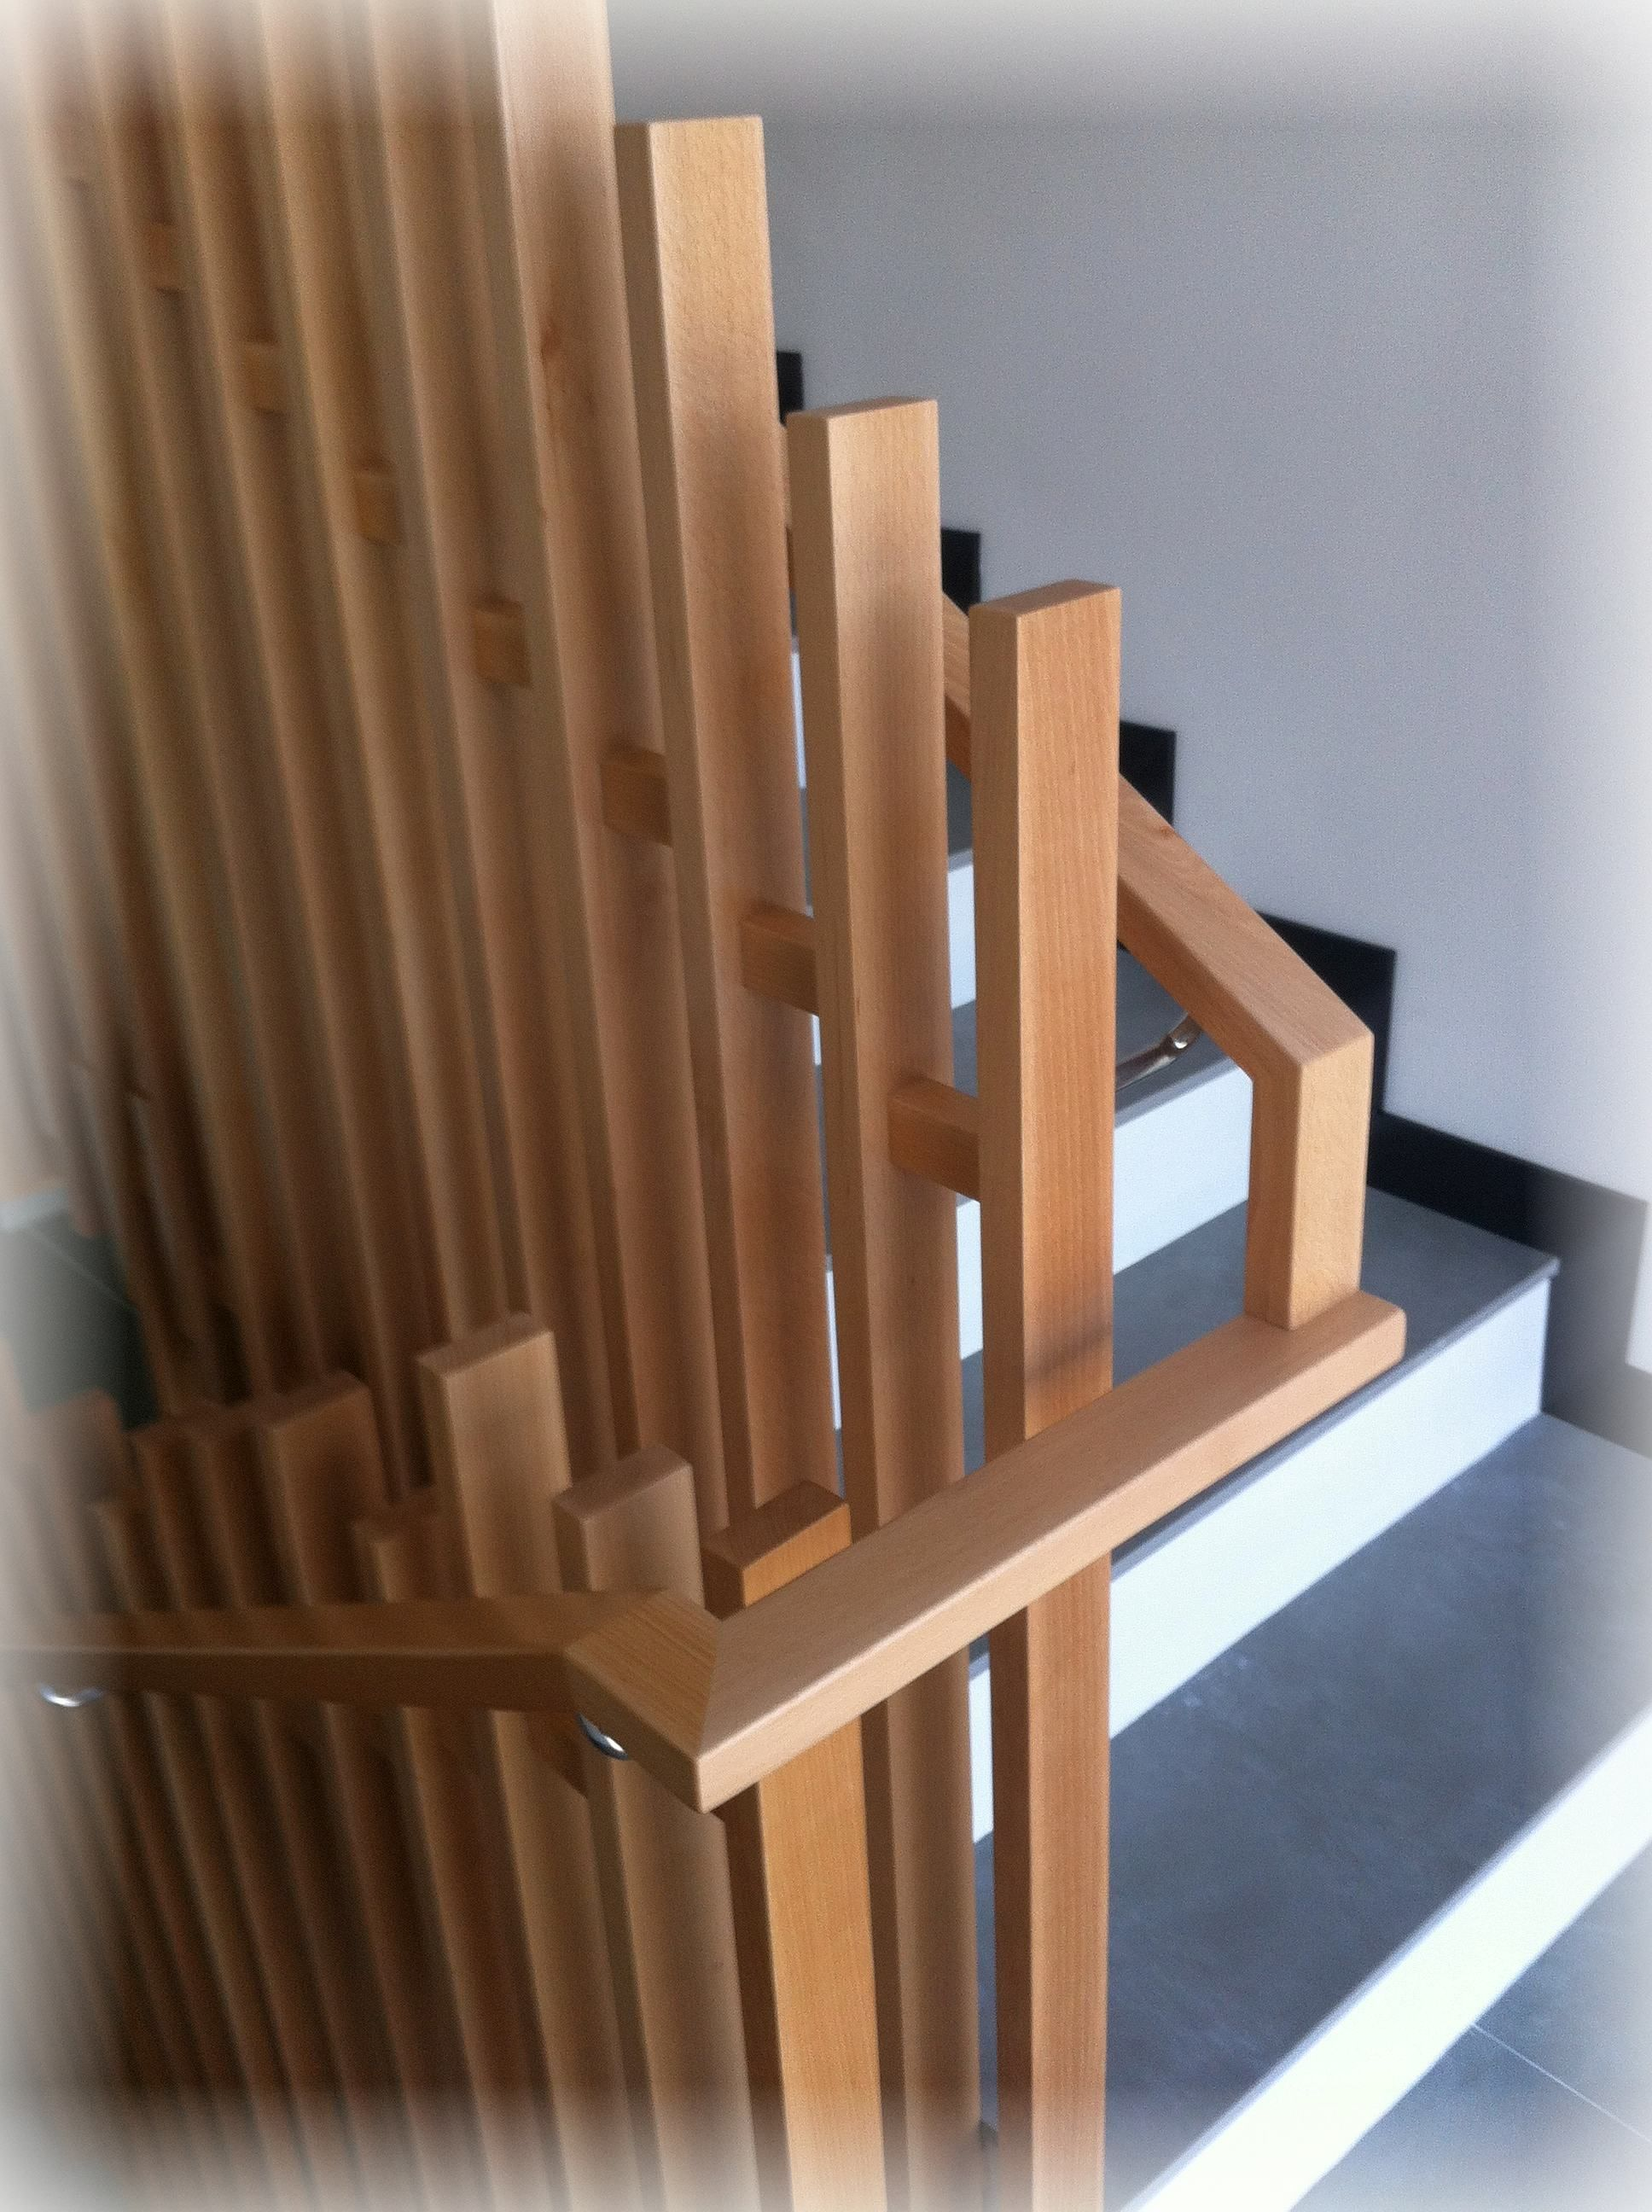 Barandilla madera diferente moderna escaleras madera pinterest moderno madera y escalera - Barandillas de madera para interior ...